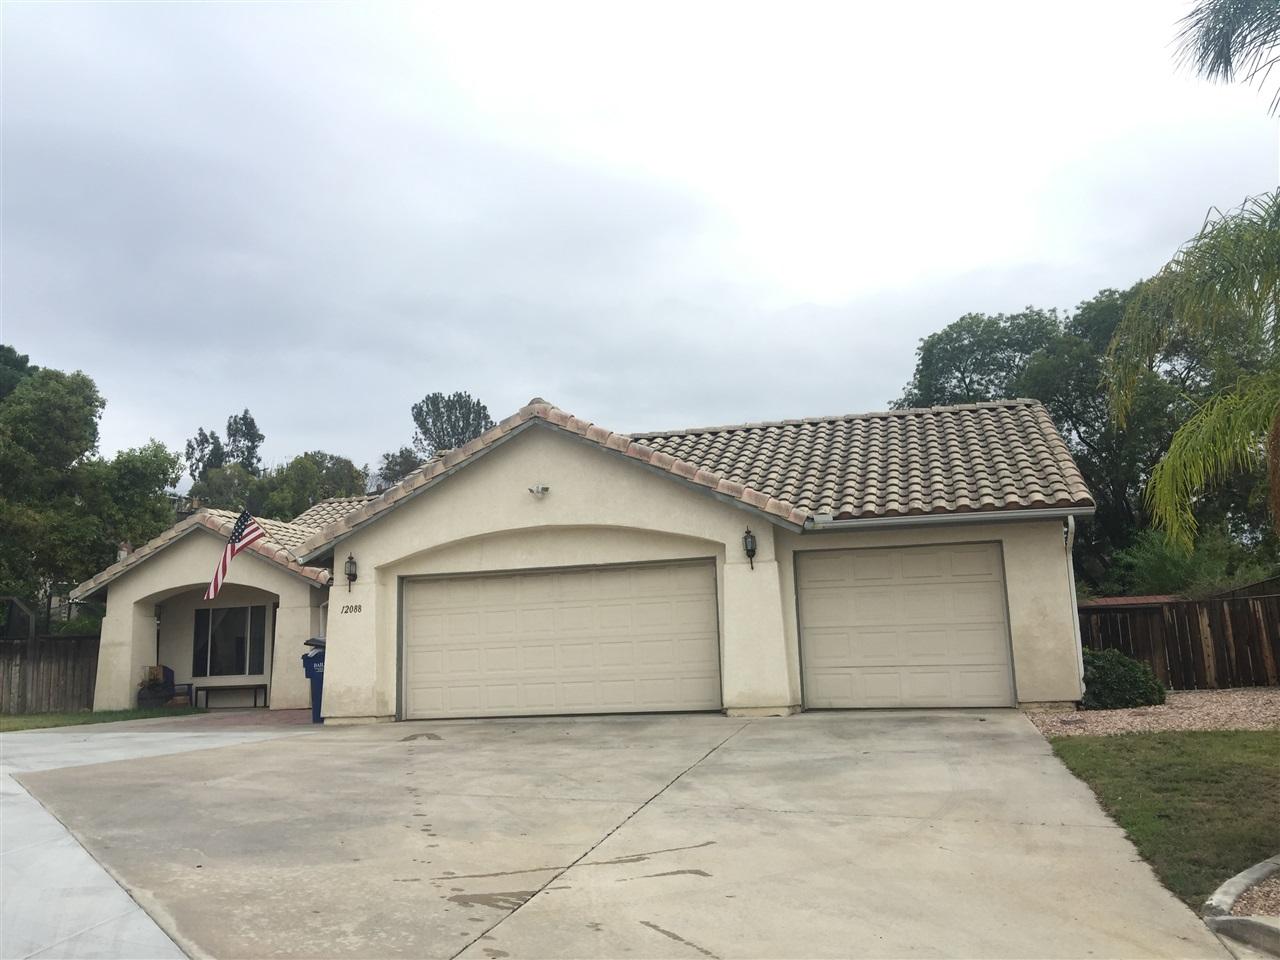 12088 Sterling Hill Lane, Lakeside, CA 92040